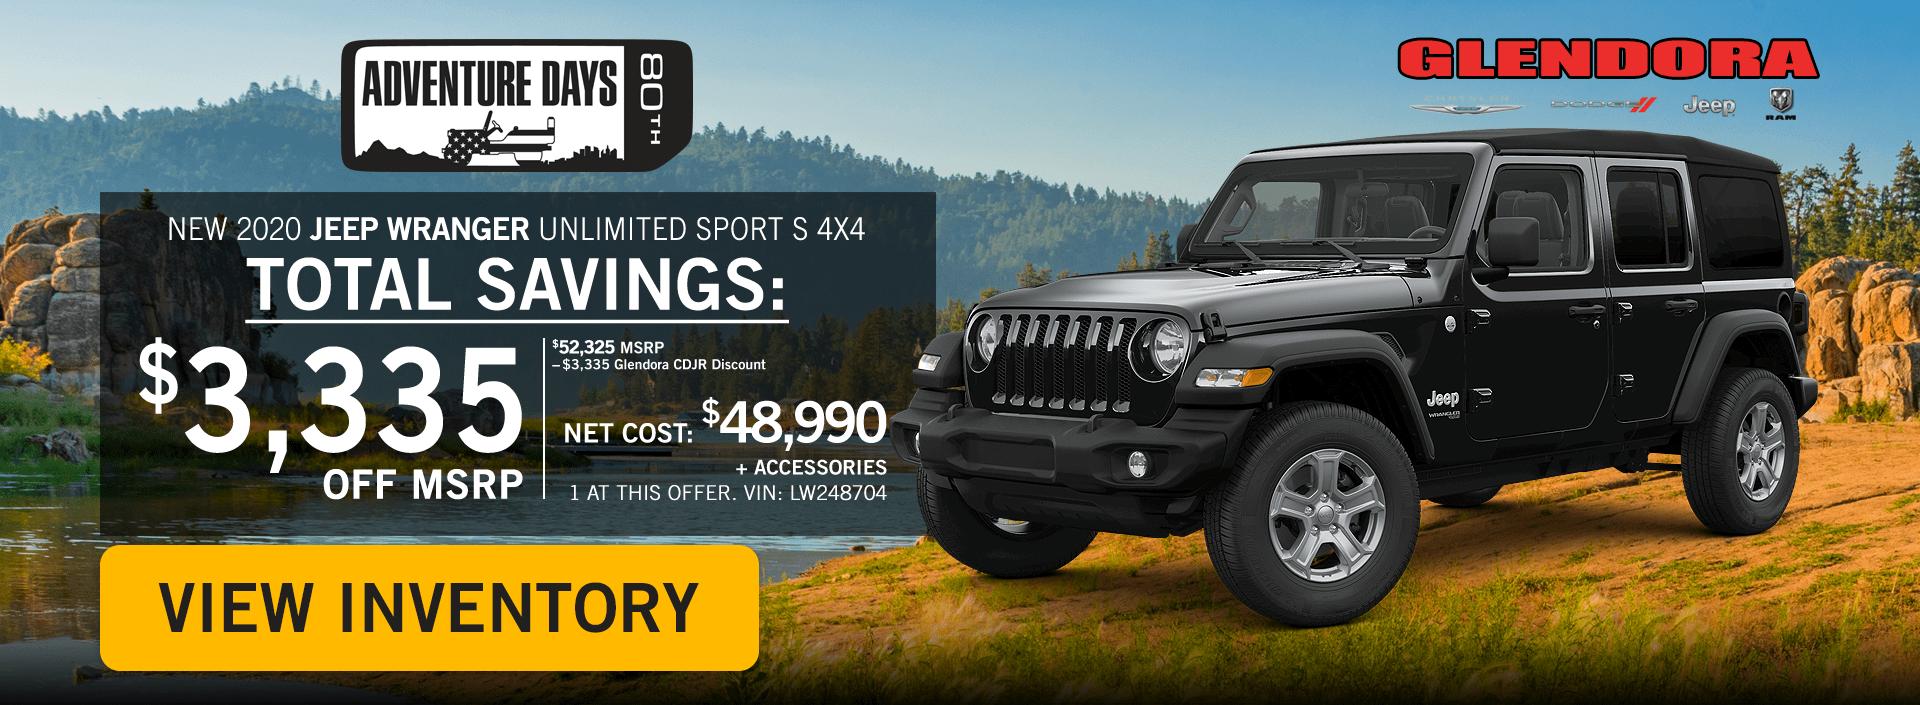 Glendora_CDJR_2020_October_Deals_Jeep_Adventure_Jeep_Wrangler_Home1